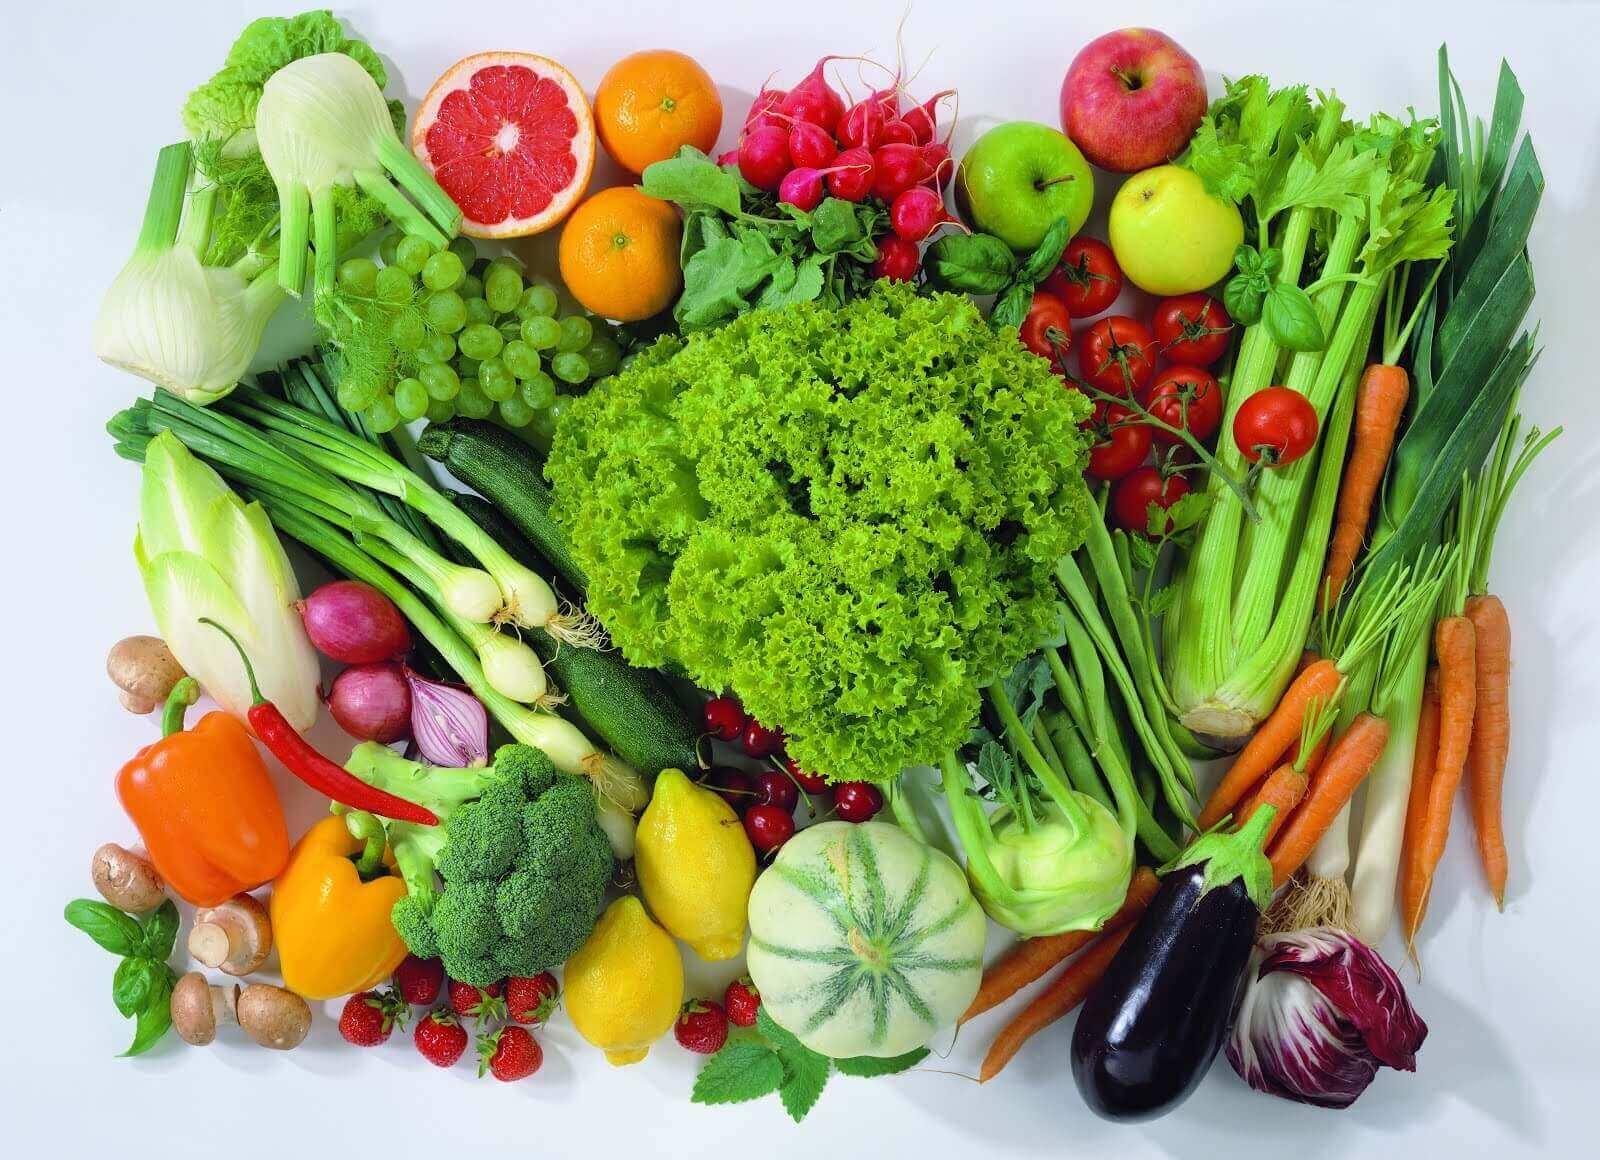 hedelmät ja vihannekset